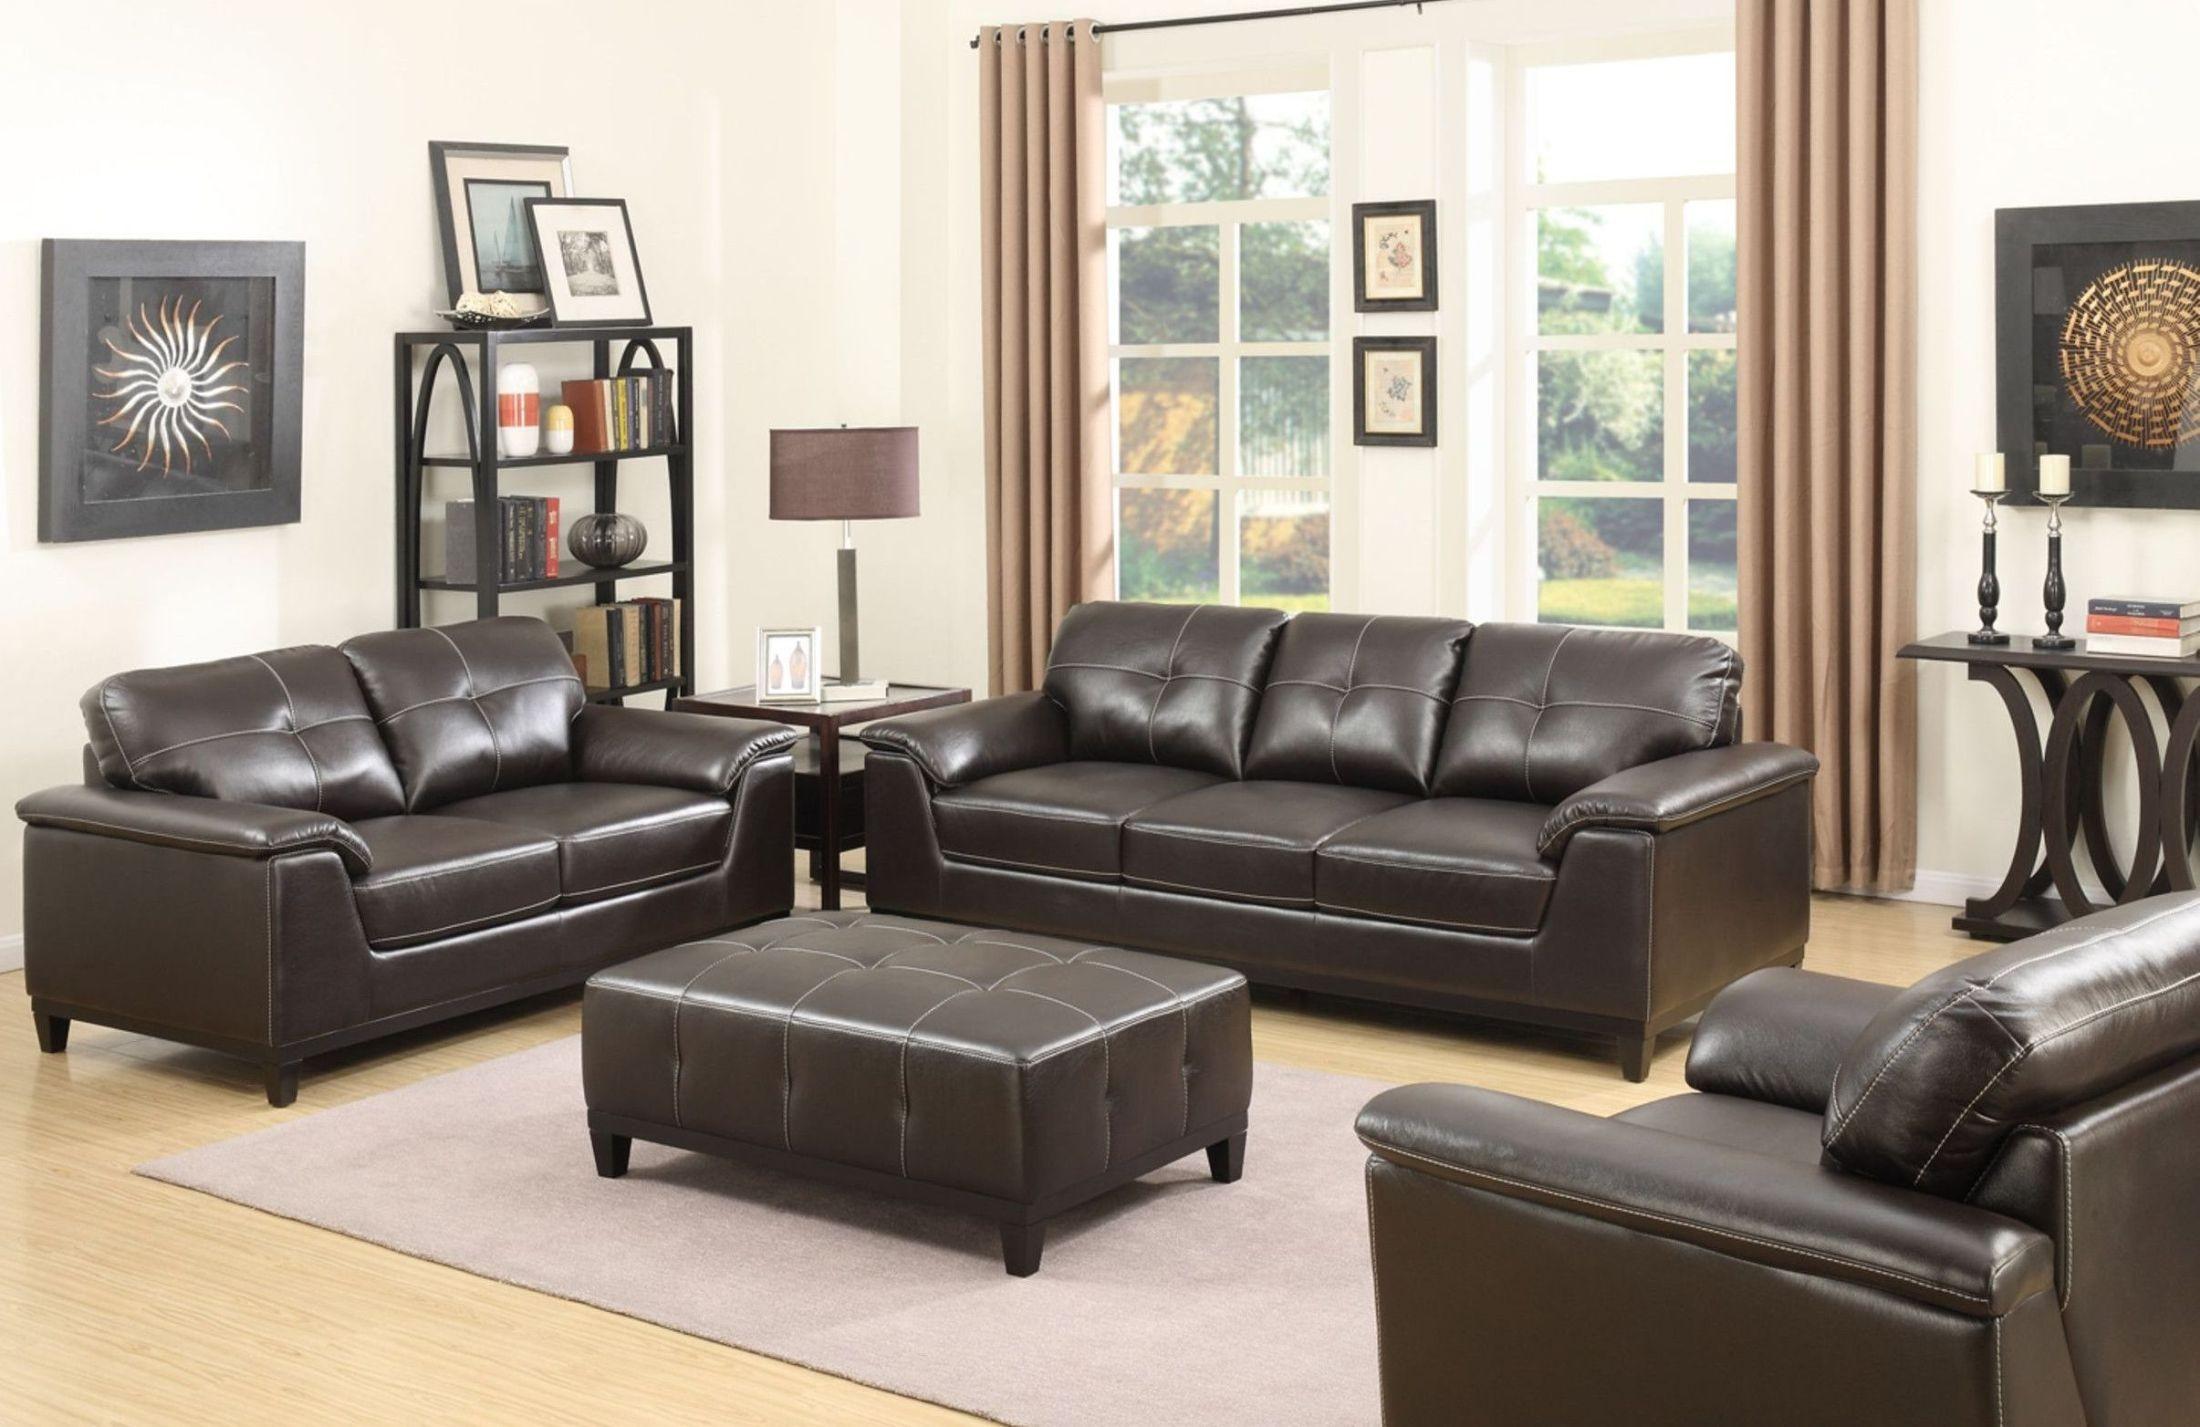 marquis walnut living room set from emerald home coleman. Black Bedroom Furniture Sets. Home Design Ideas